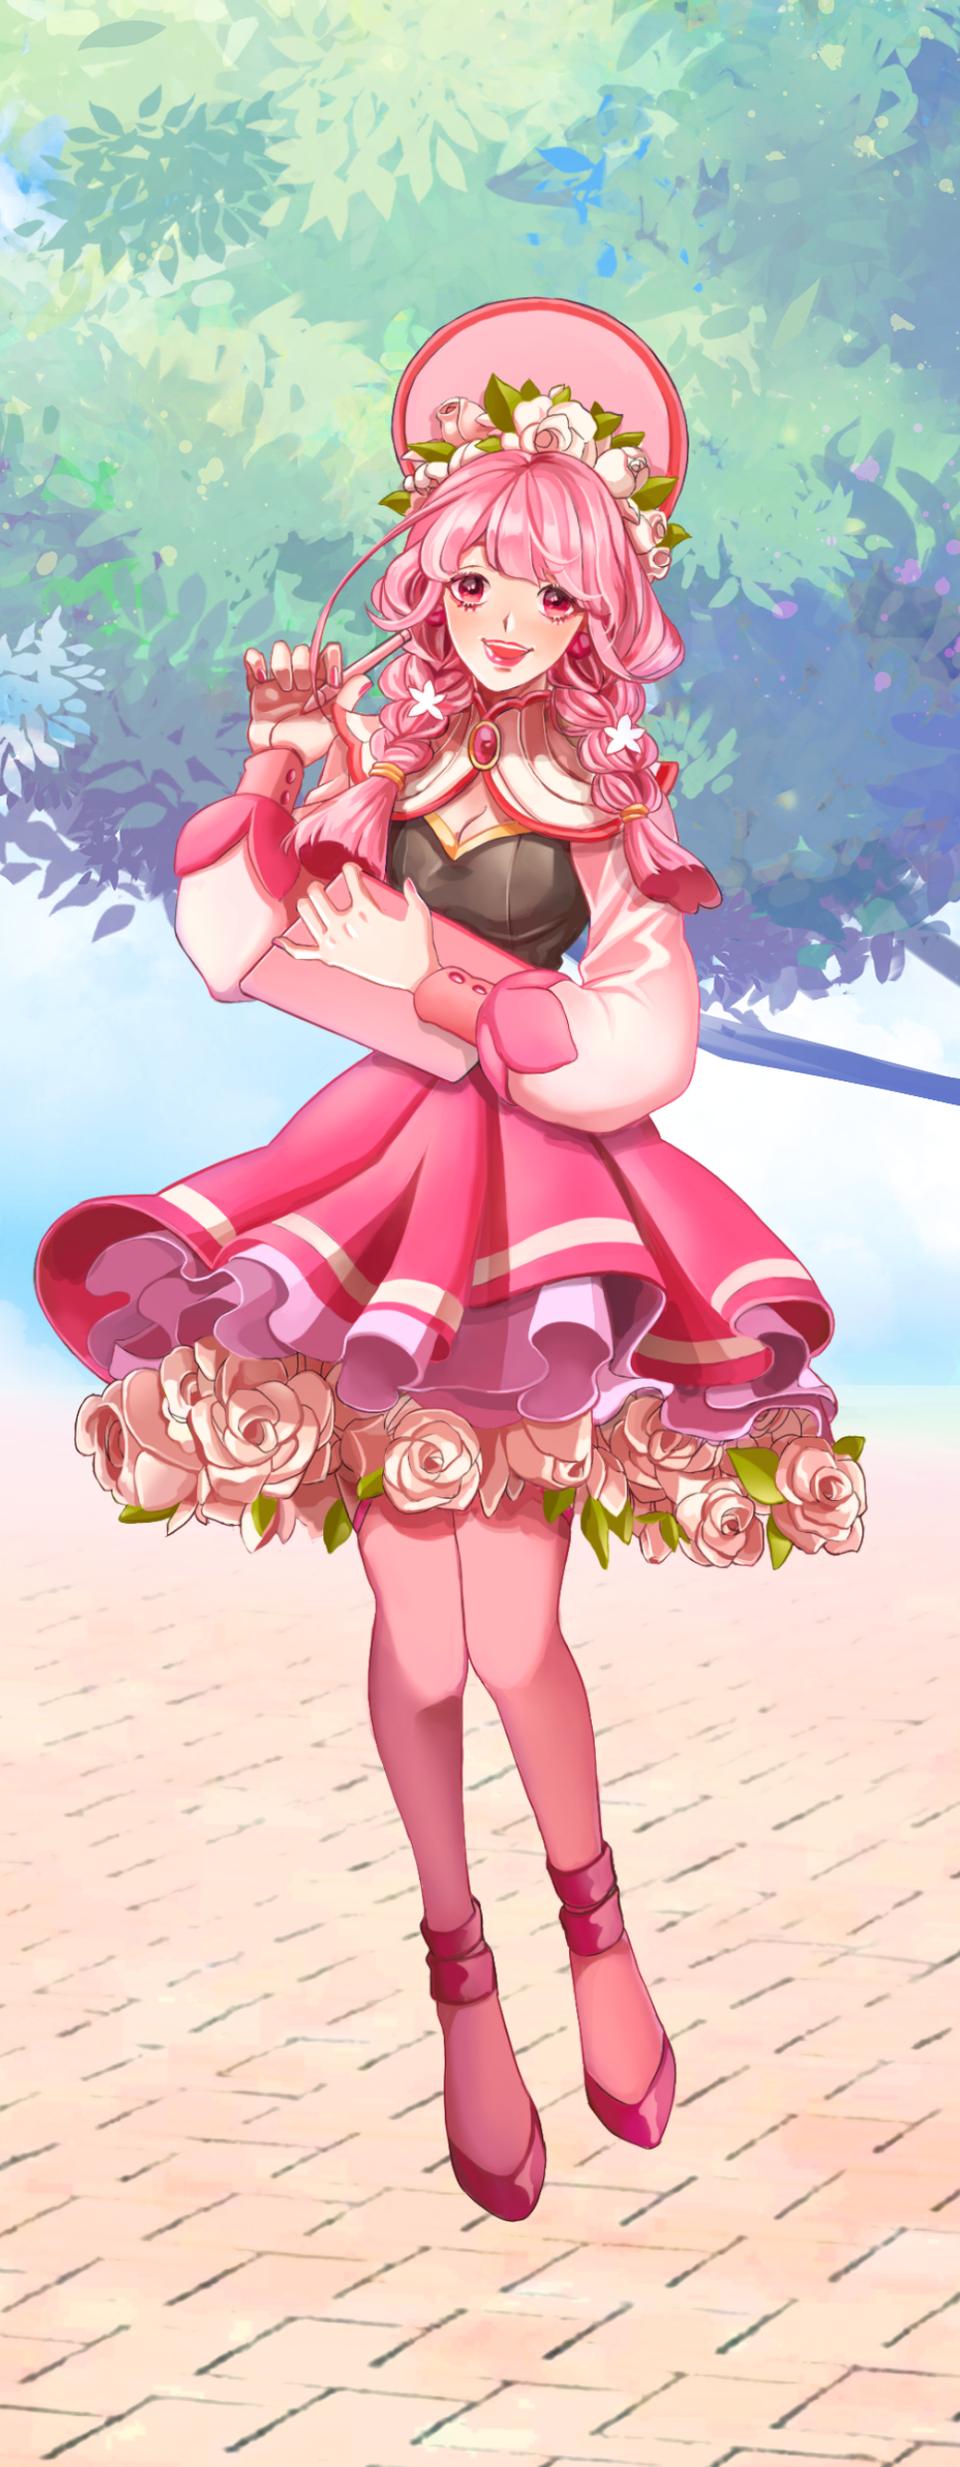 Pink girl Illust of 許阿落 PASTEL_SKETCH2020